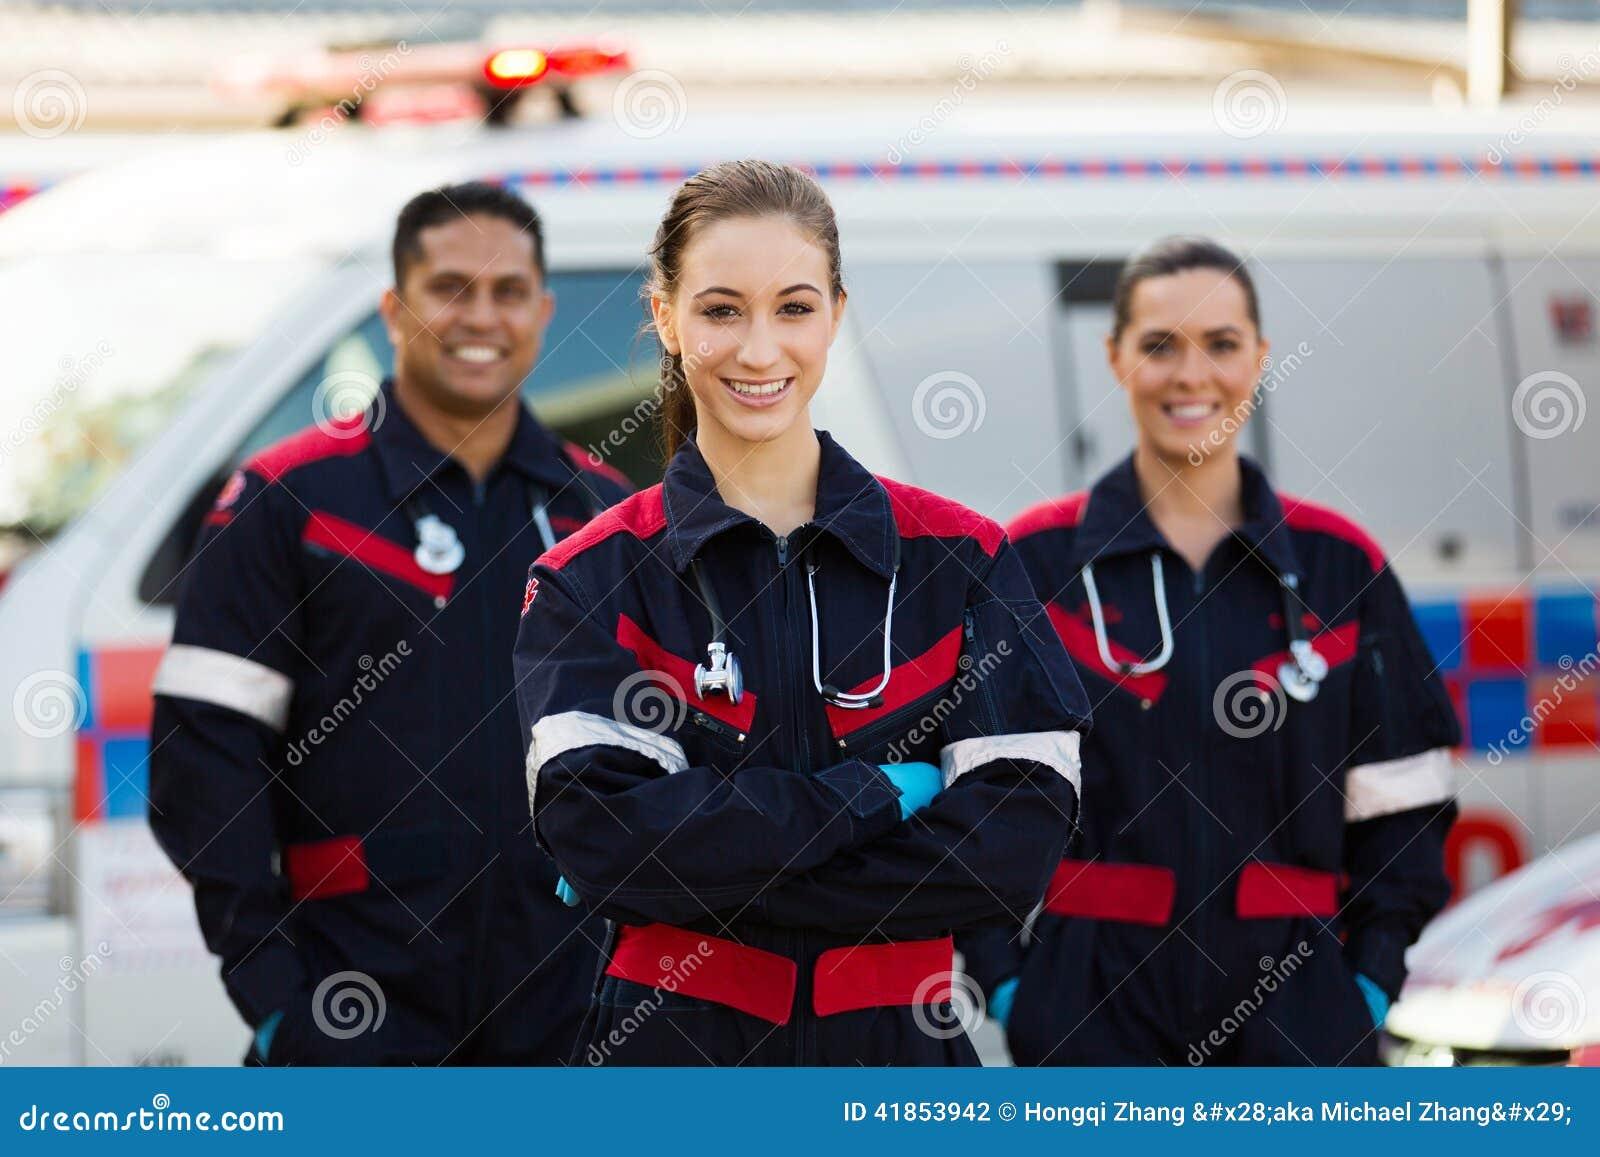 Emergency medical technicians